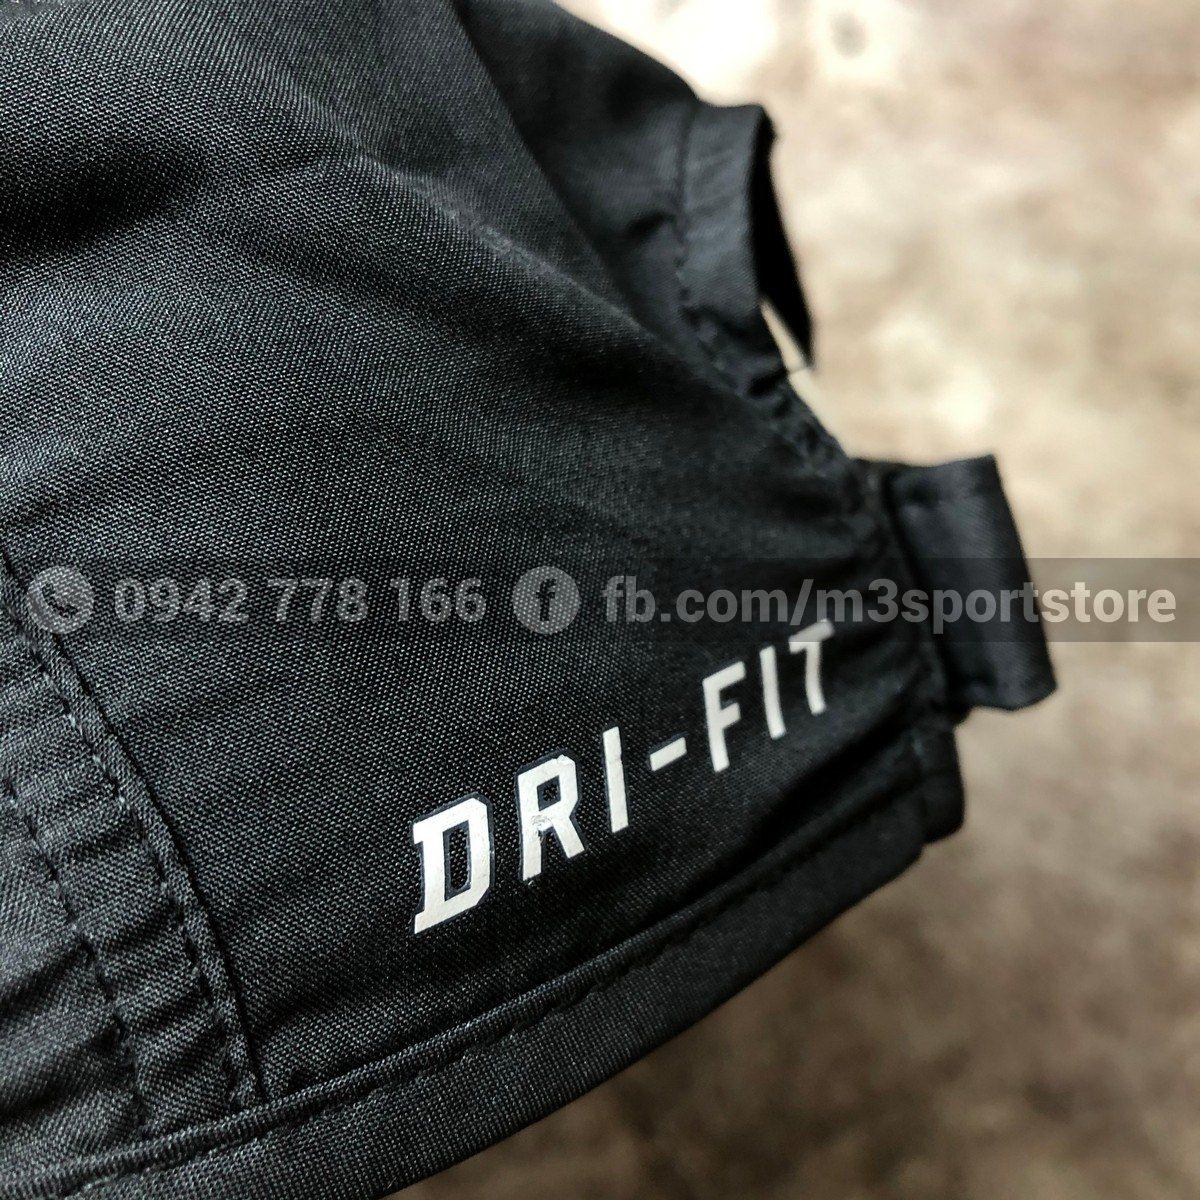 Mũ thể thao NIKE DRI-FIT TENNIS RUNNING CAP HAT 611811